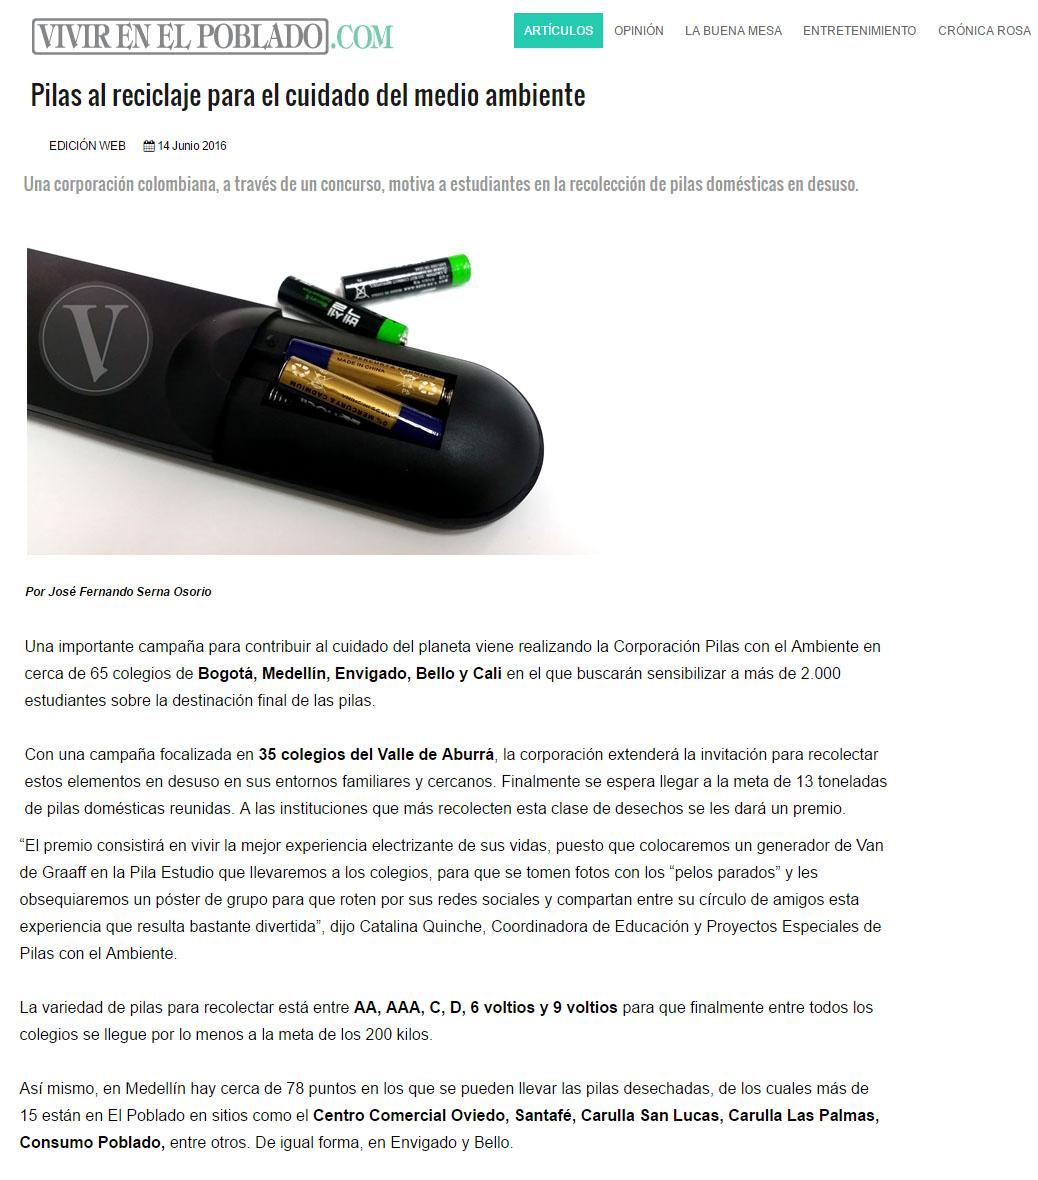 PILA ESTUDIO-www.vivirenelpoblado.com 14-06-2016